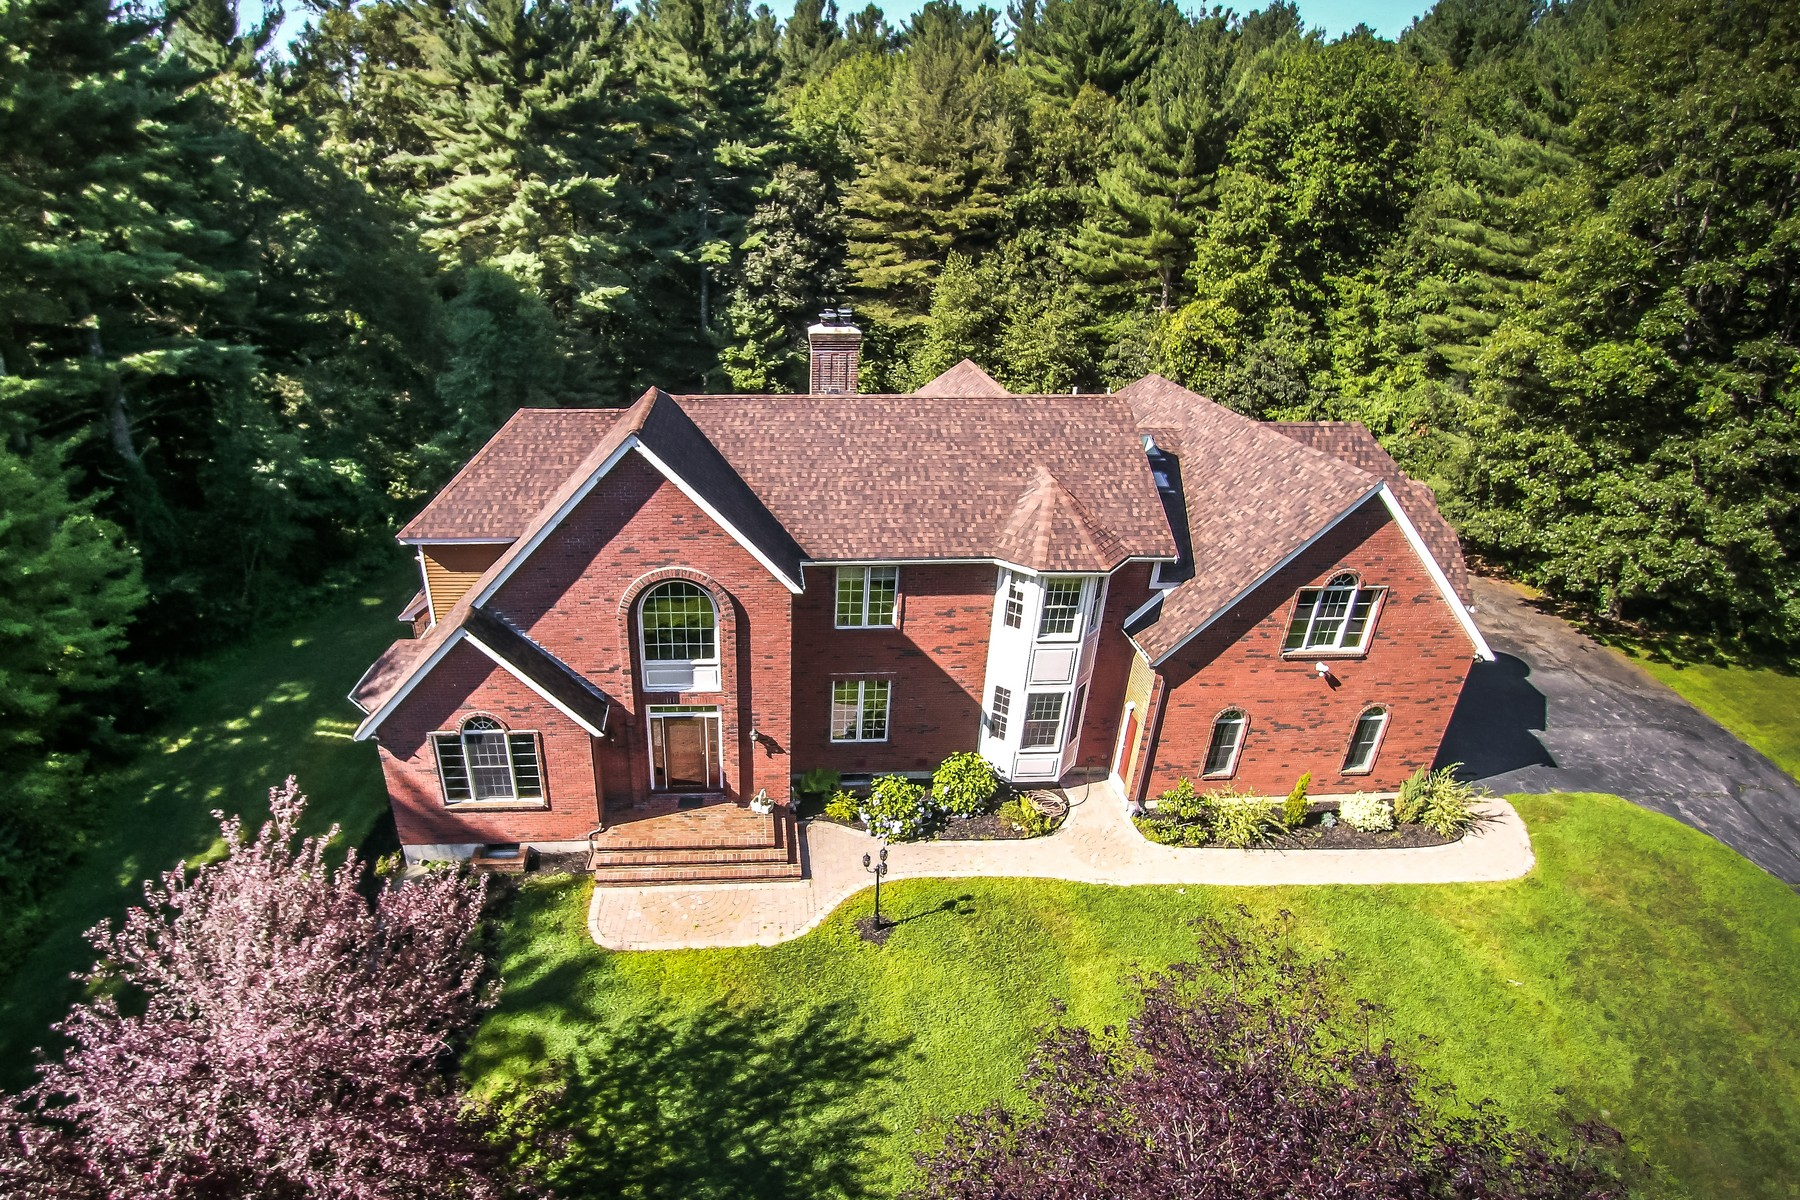 Villa per Vendita alle ore Stately Colonial 261 Green St Northborough, Massachusetts, 01516 Stati Uniti